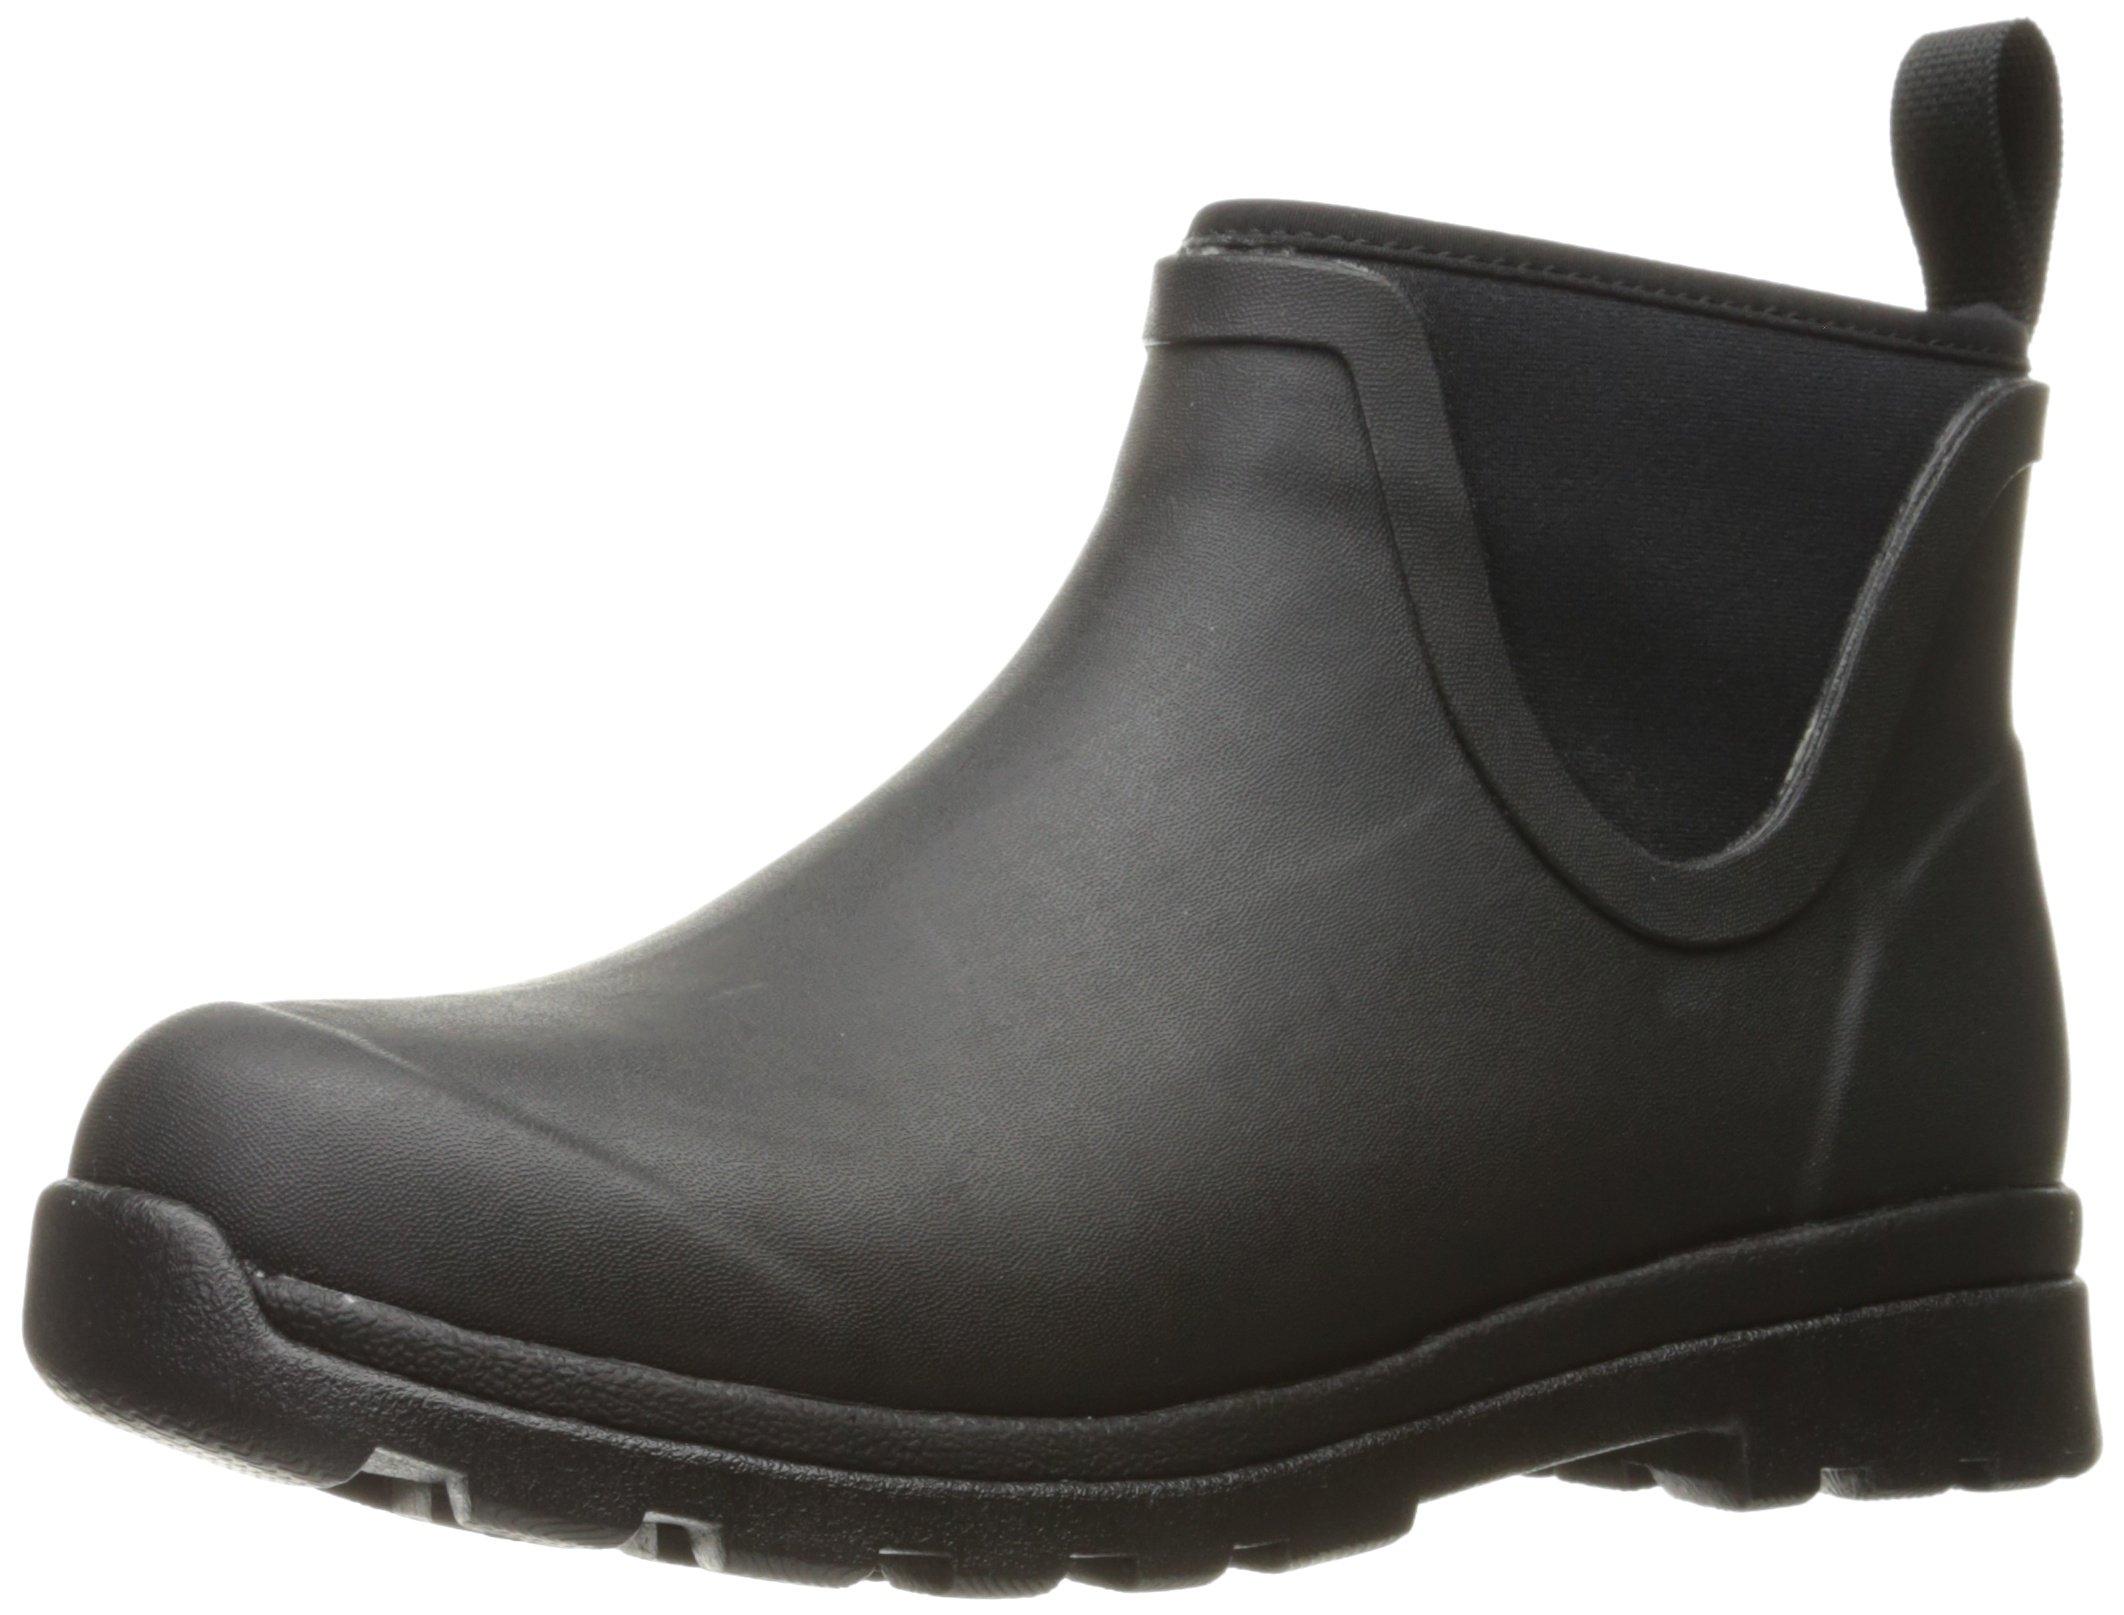 Muck Cambridge Women's Ankle Rain Boots